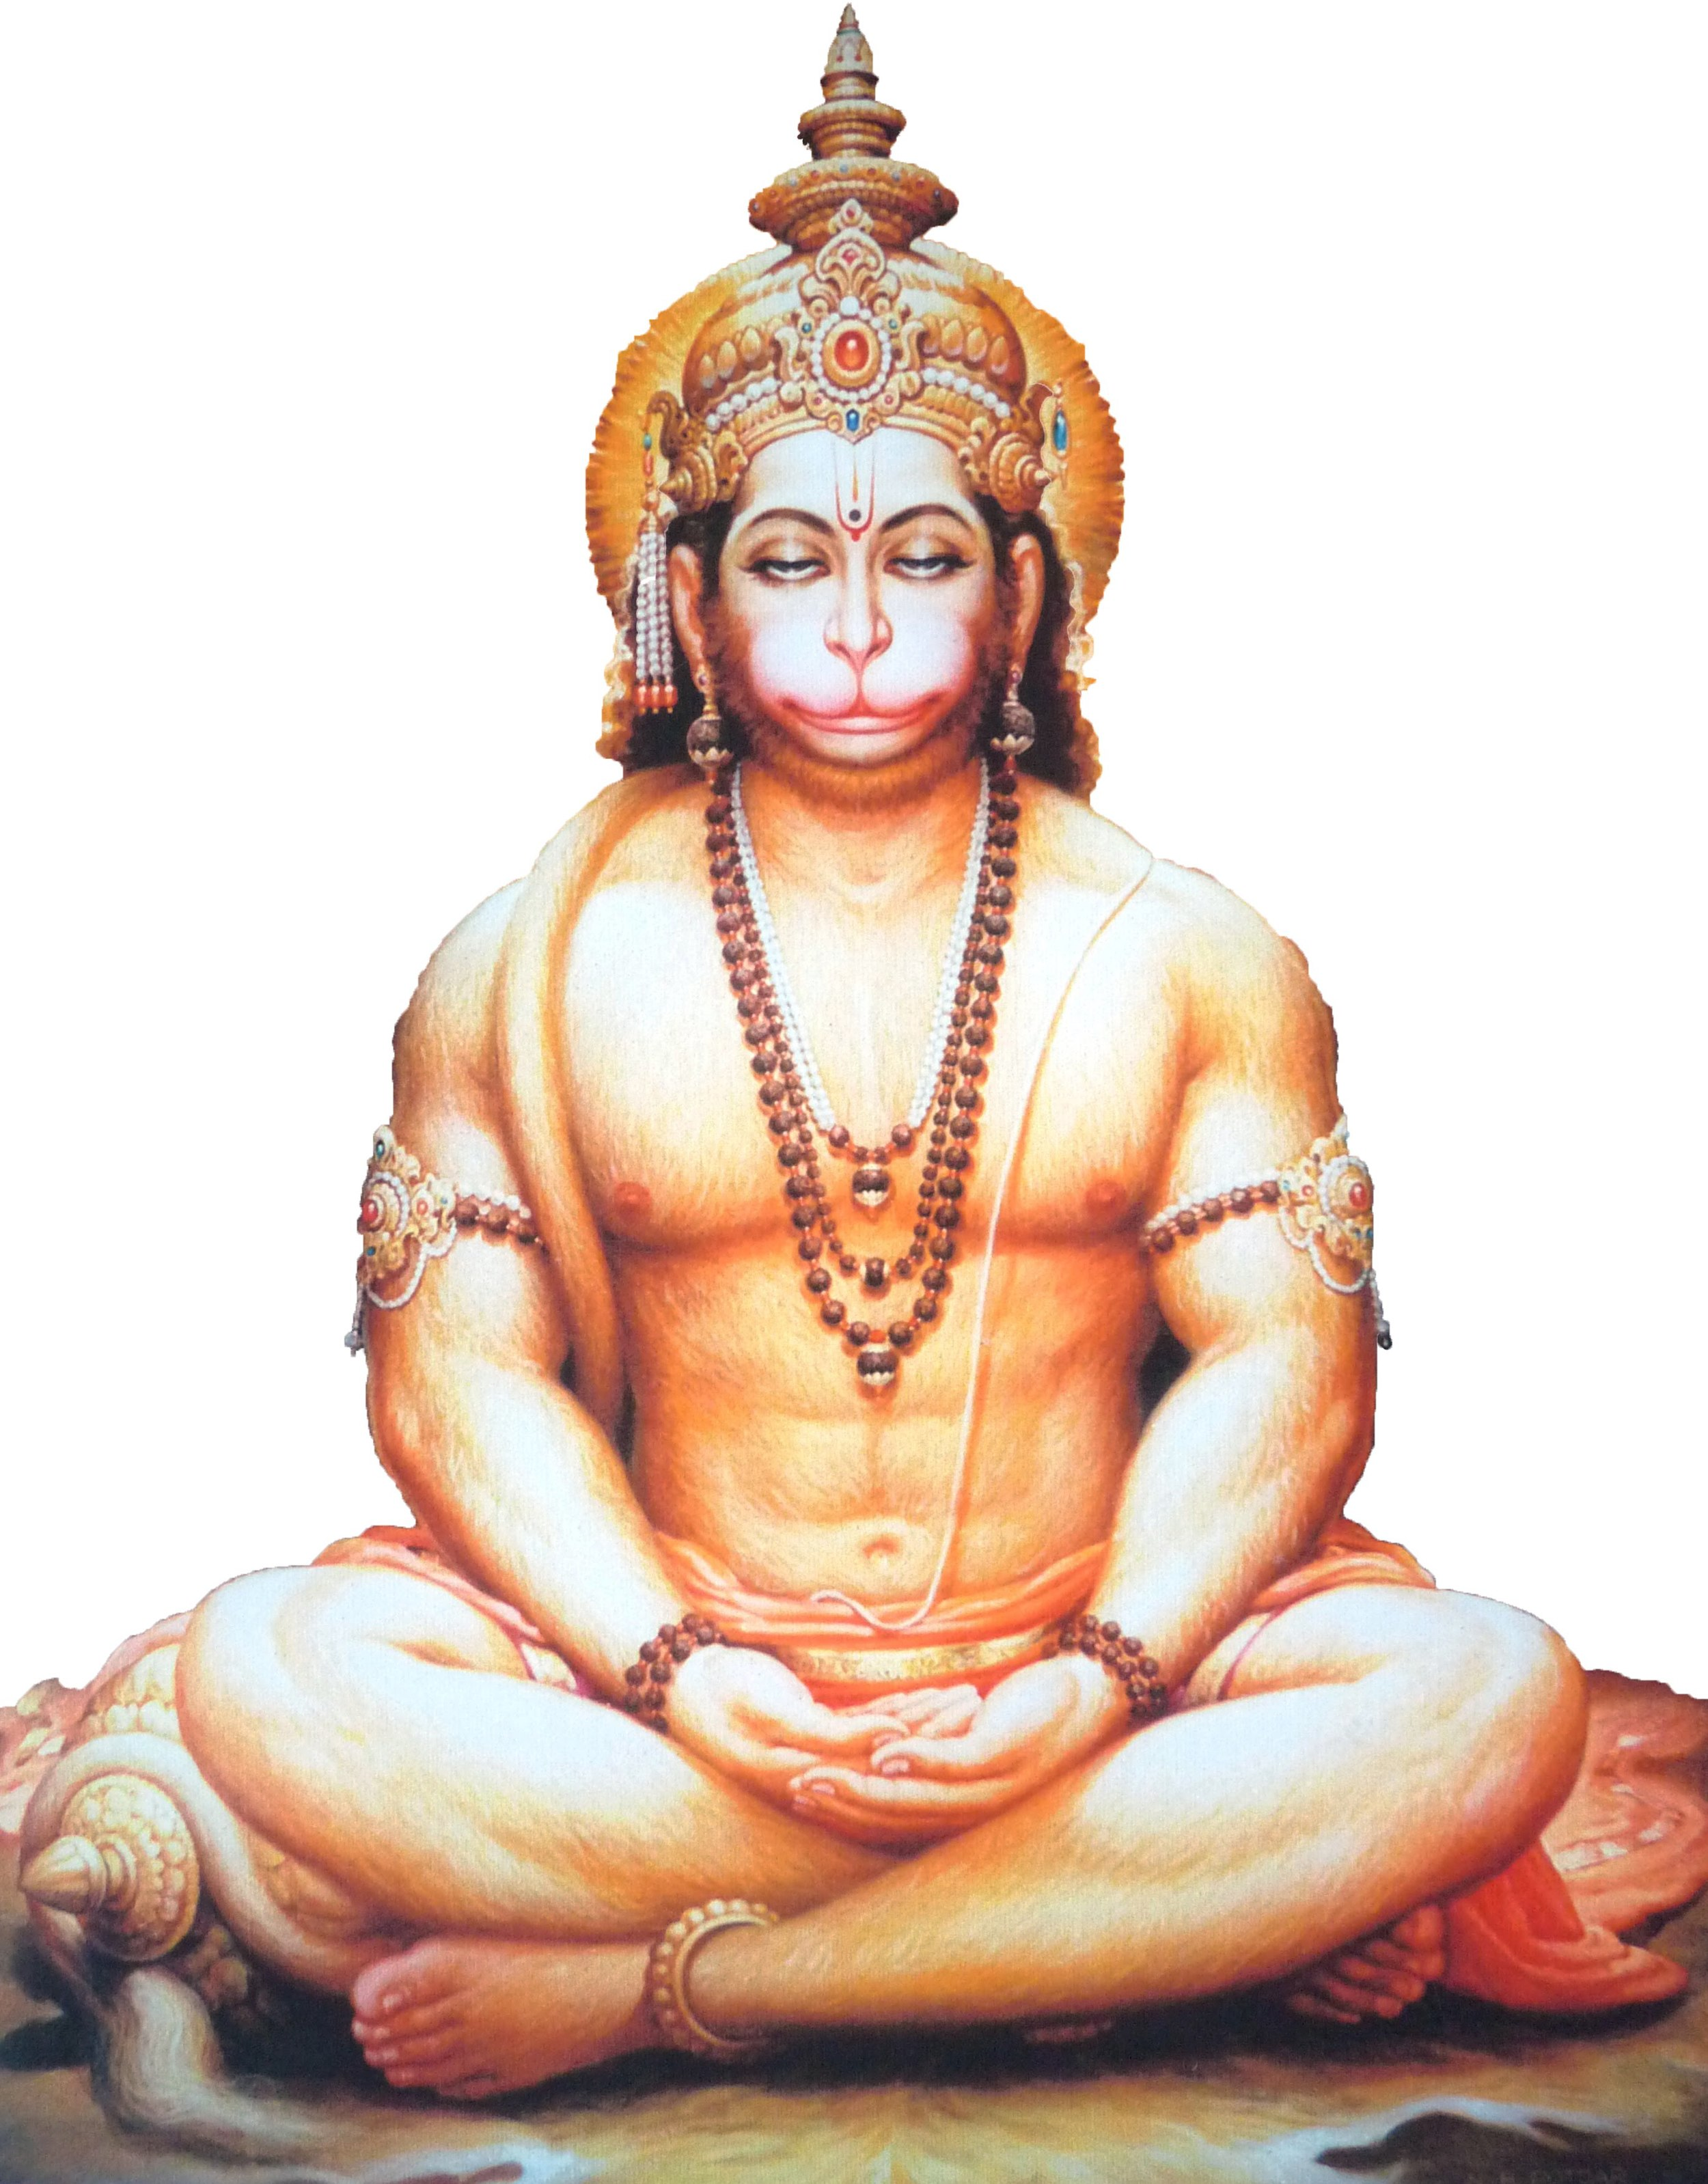 Hanumān, immersed in meditation upon Śrī Rāma.